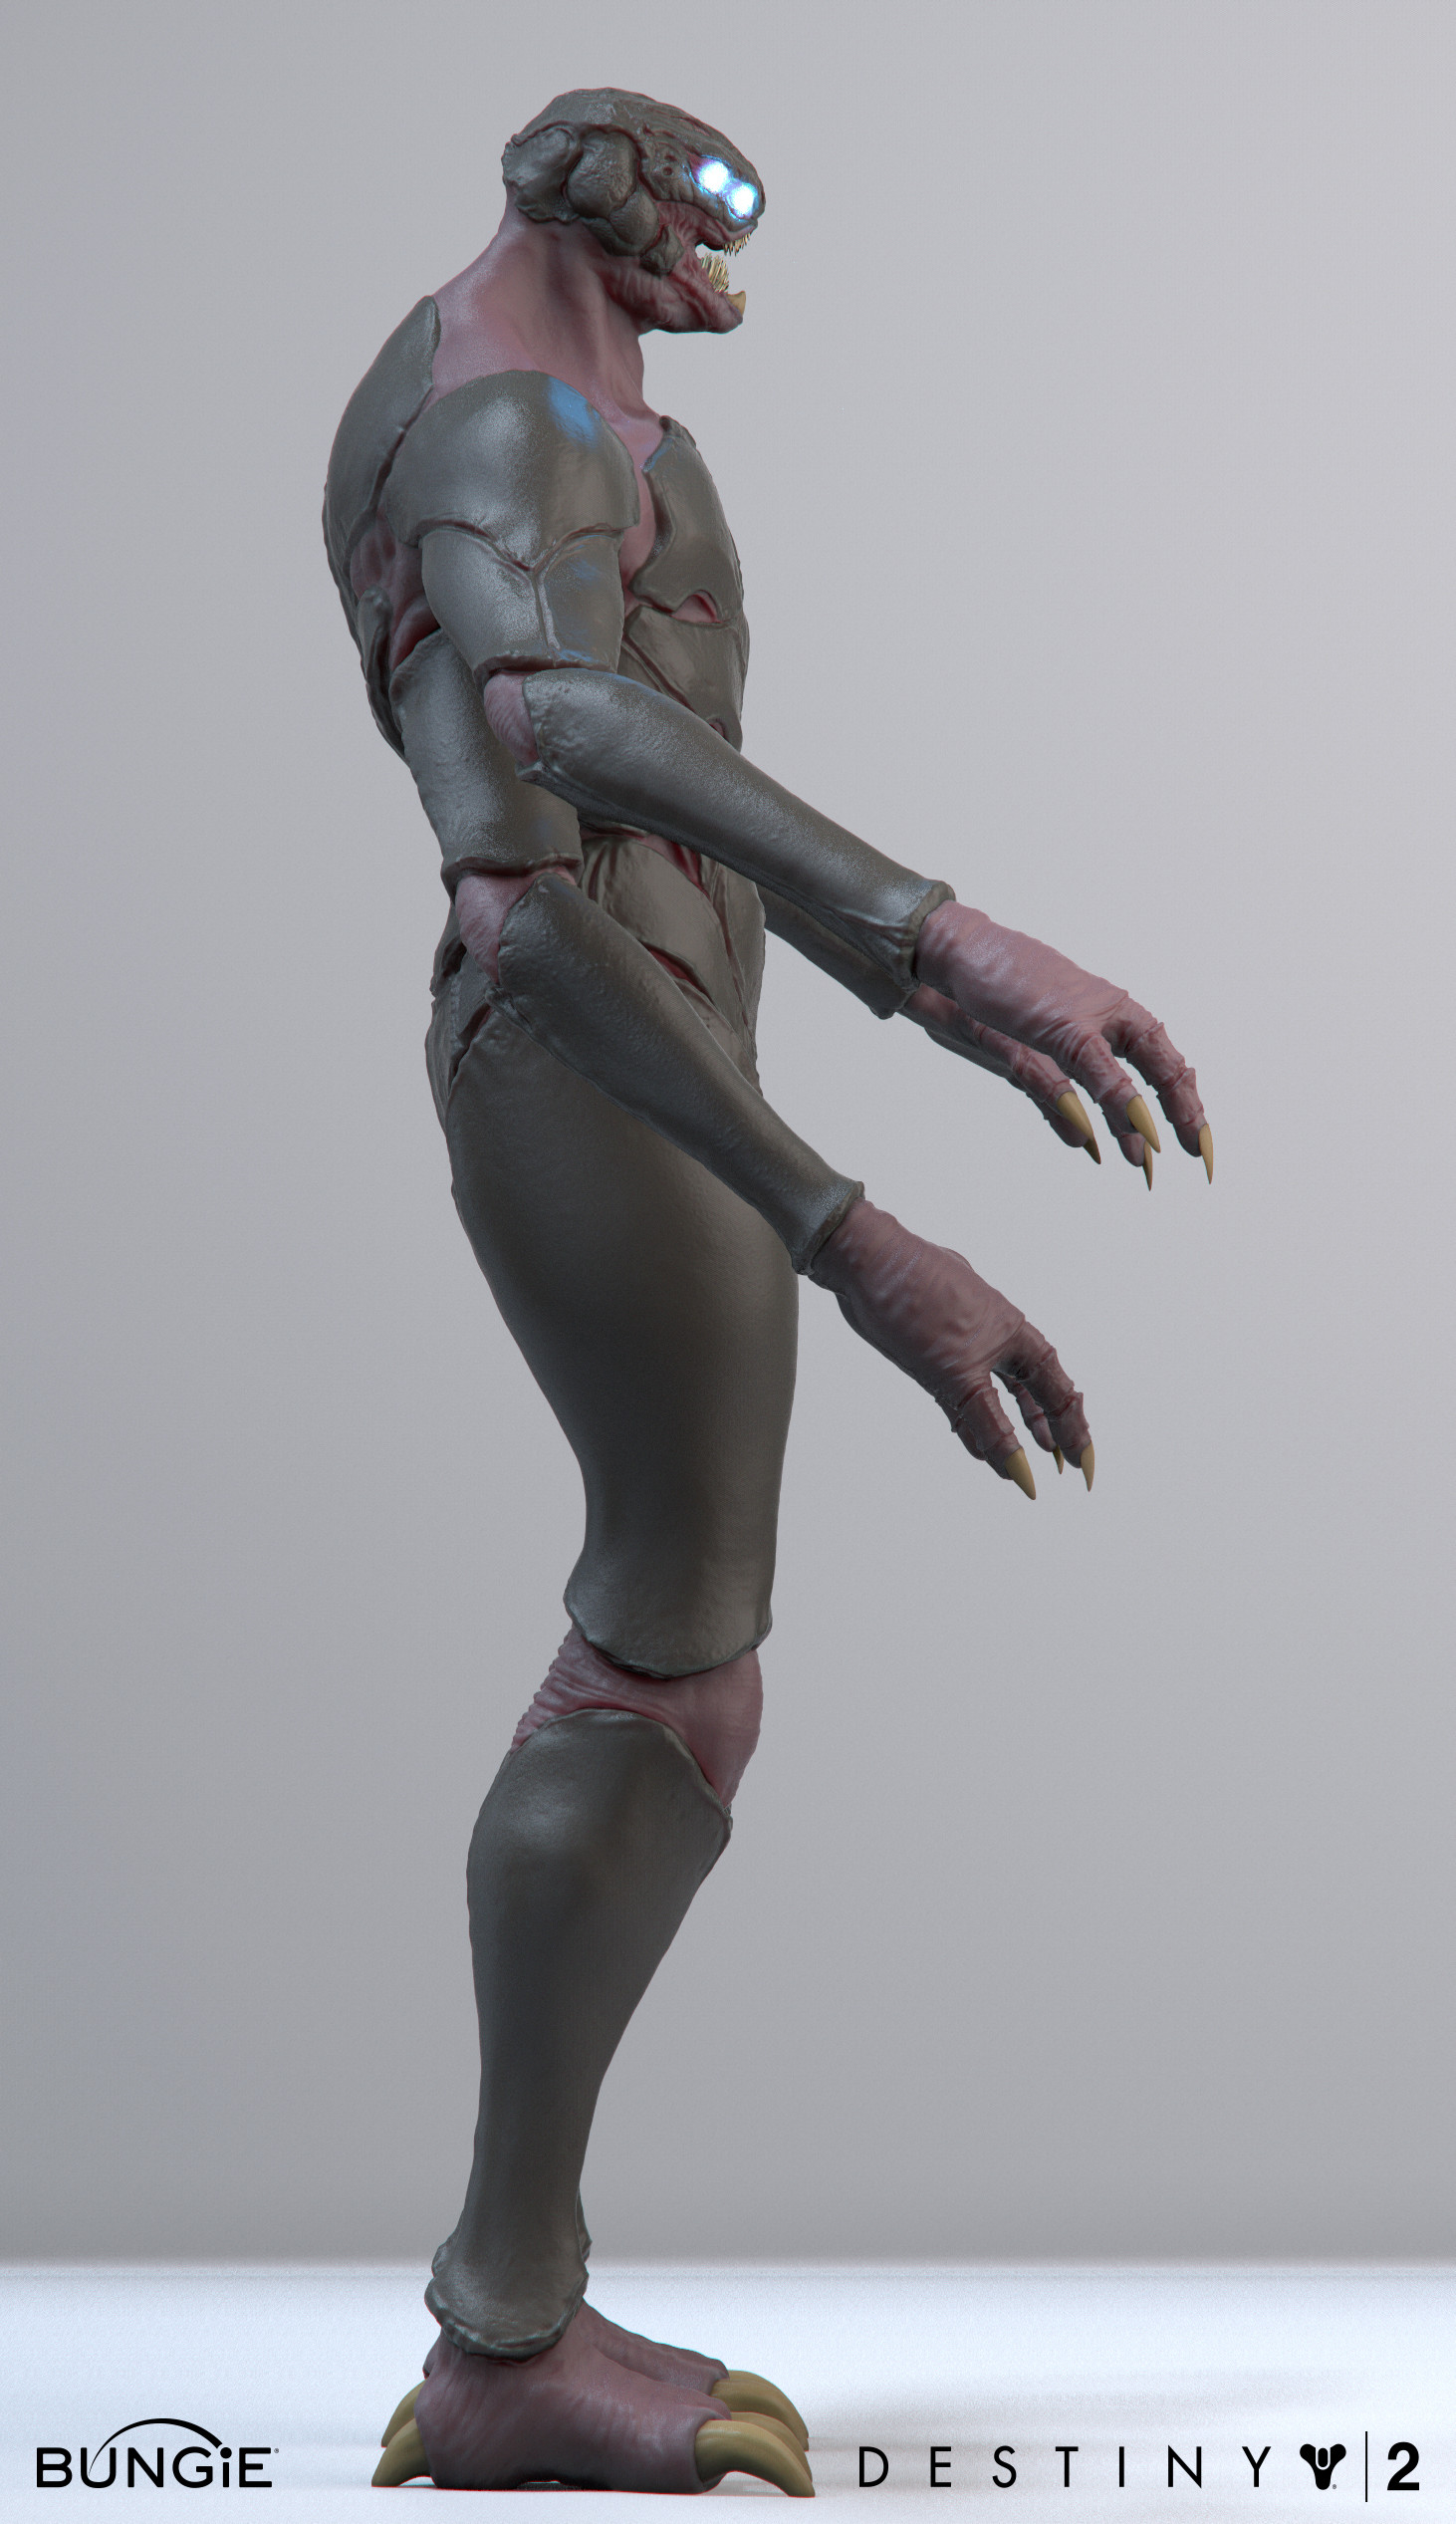 ArtStation - Destiny 2 Fallen Body, Roderick Weise